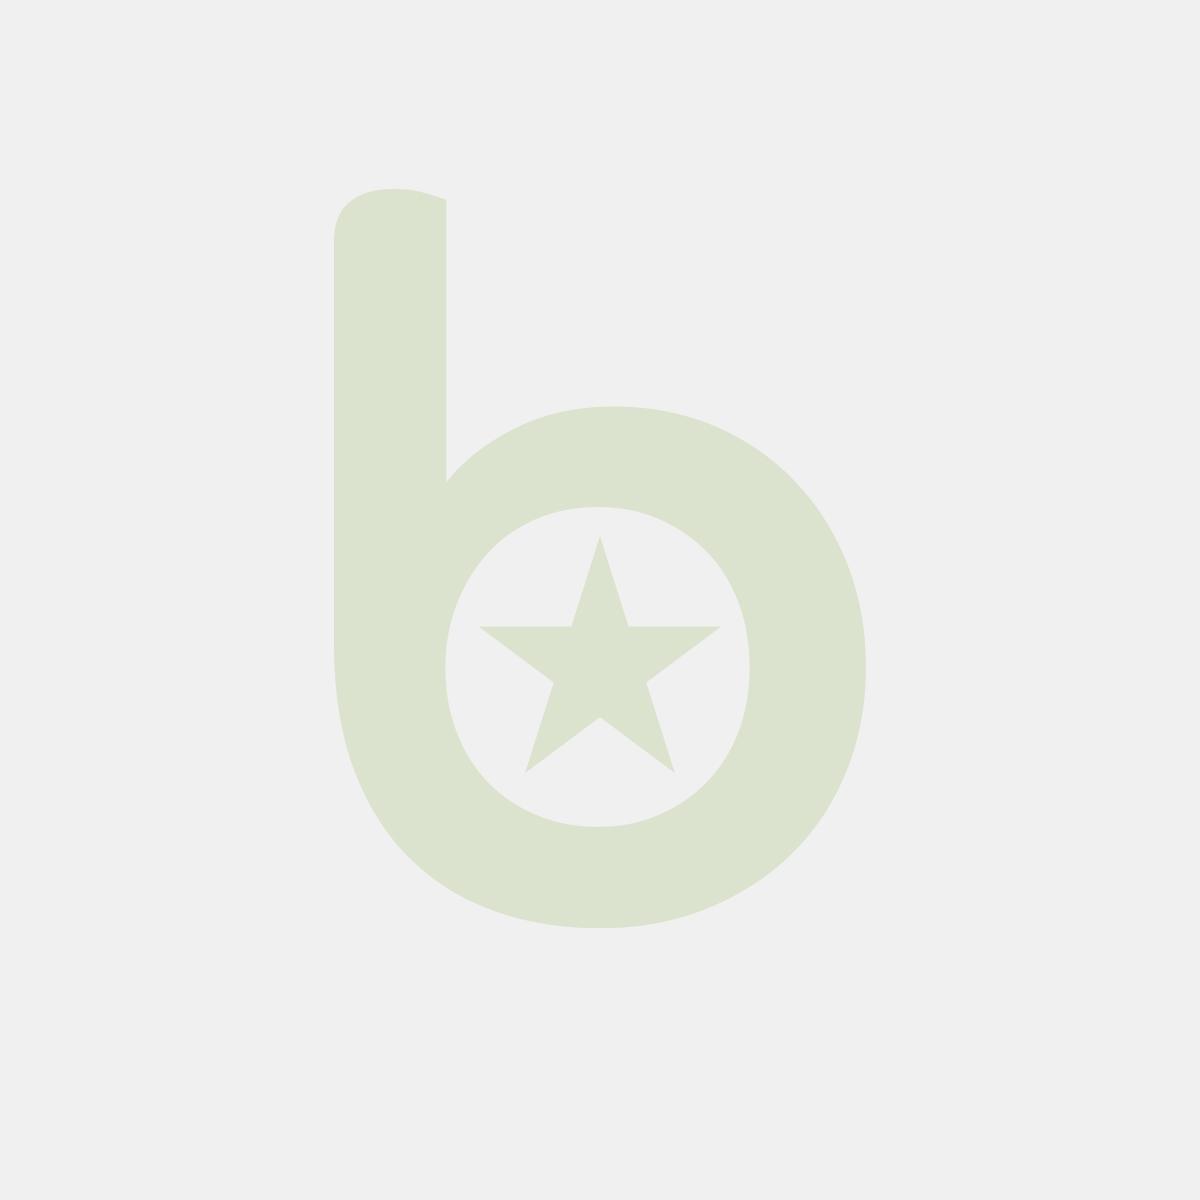 Obrus PAPSTAR Royal Collection 5m/1,18m fuksja